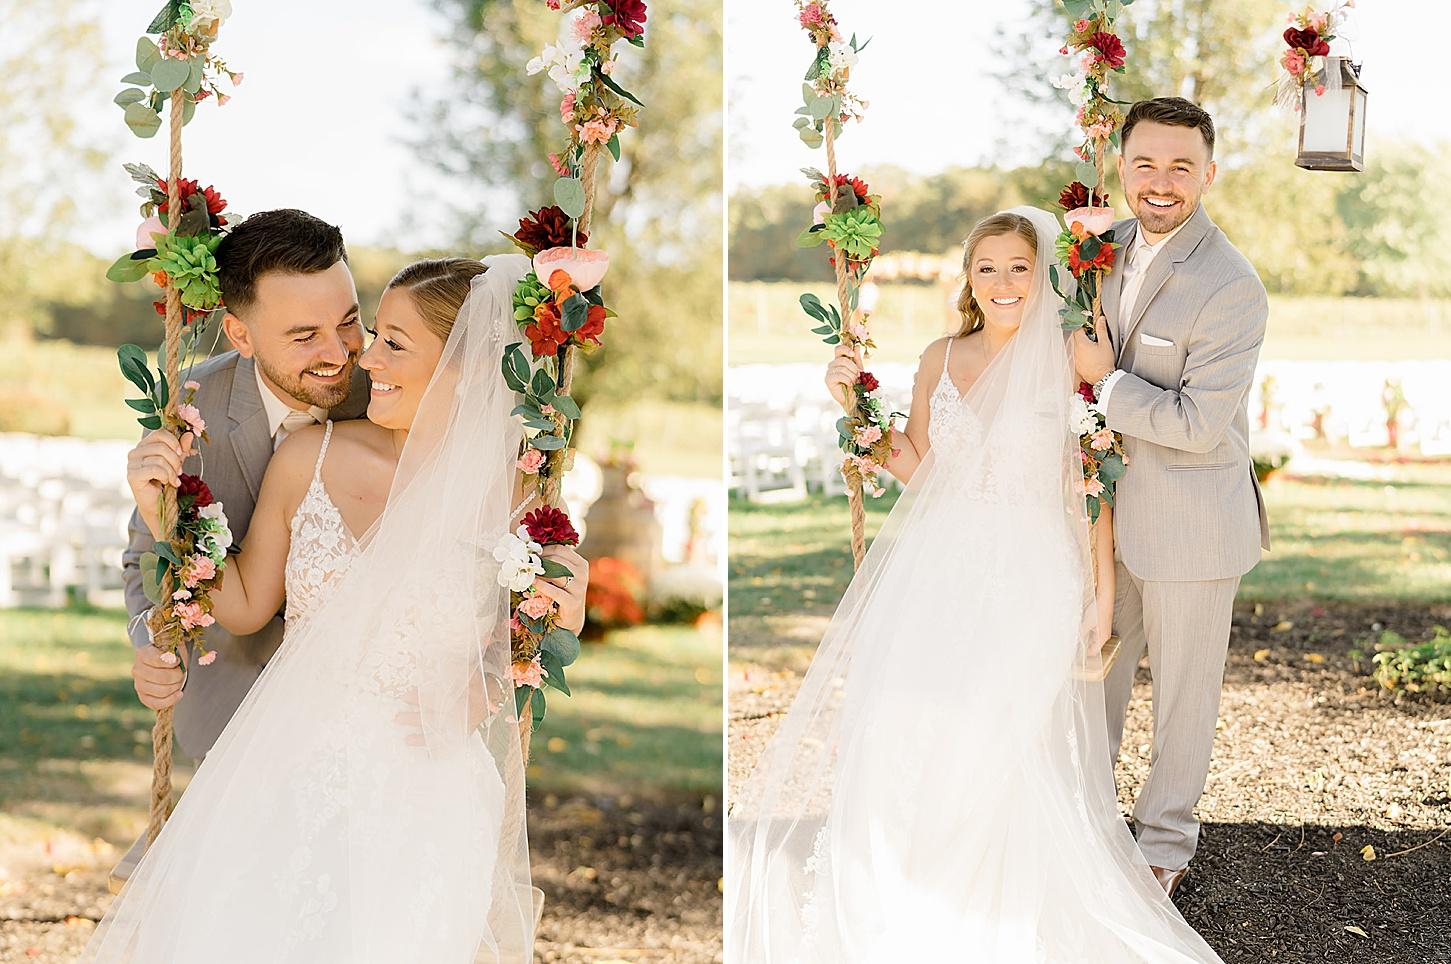 Valenzano Winery Vitners Pavillion Wedding Photography by Magdalena Studios 0013